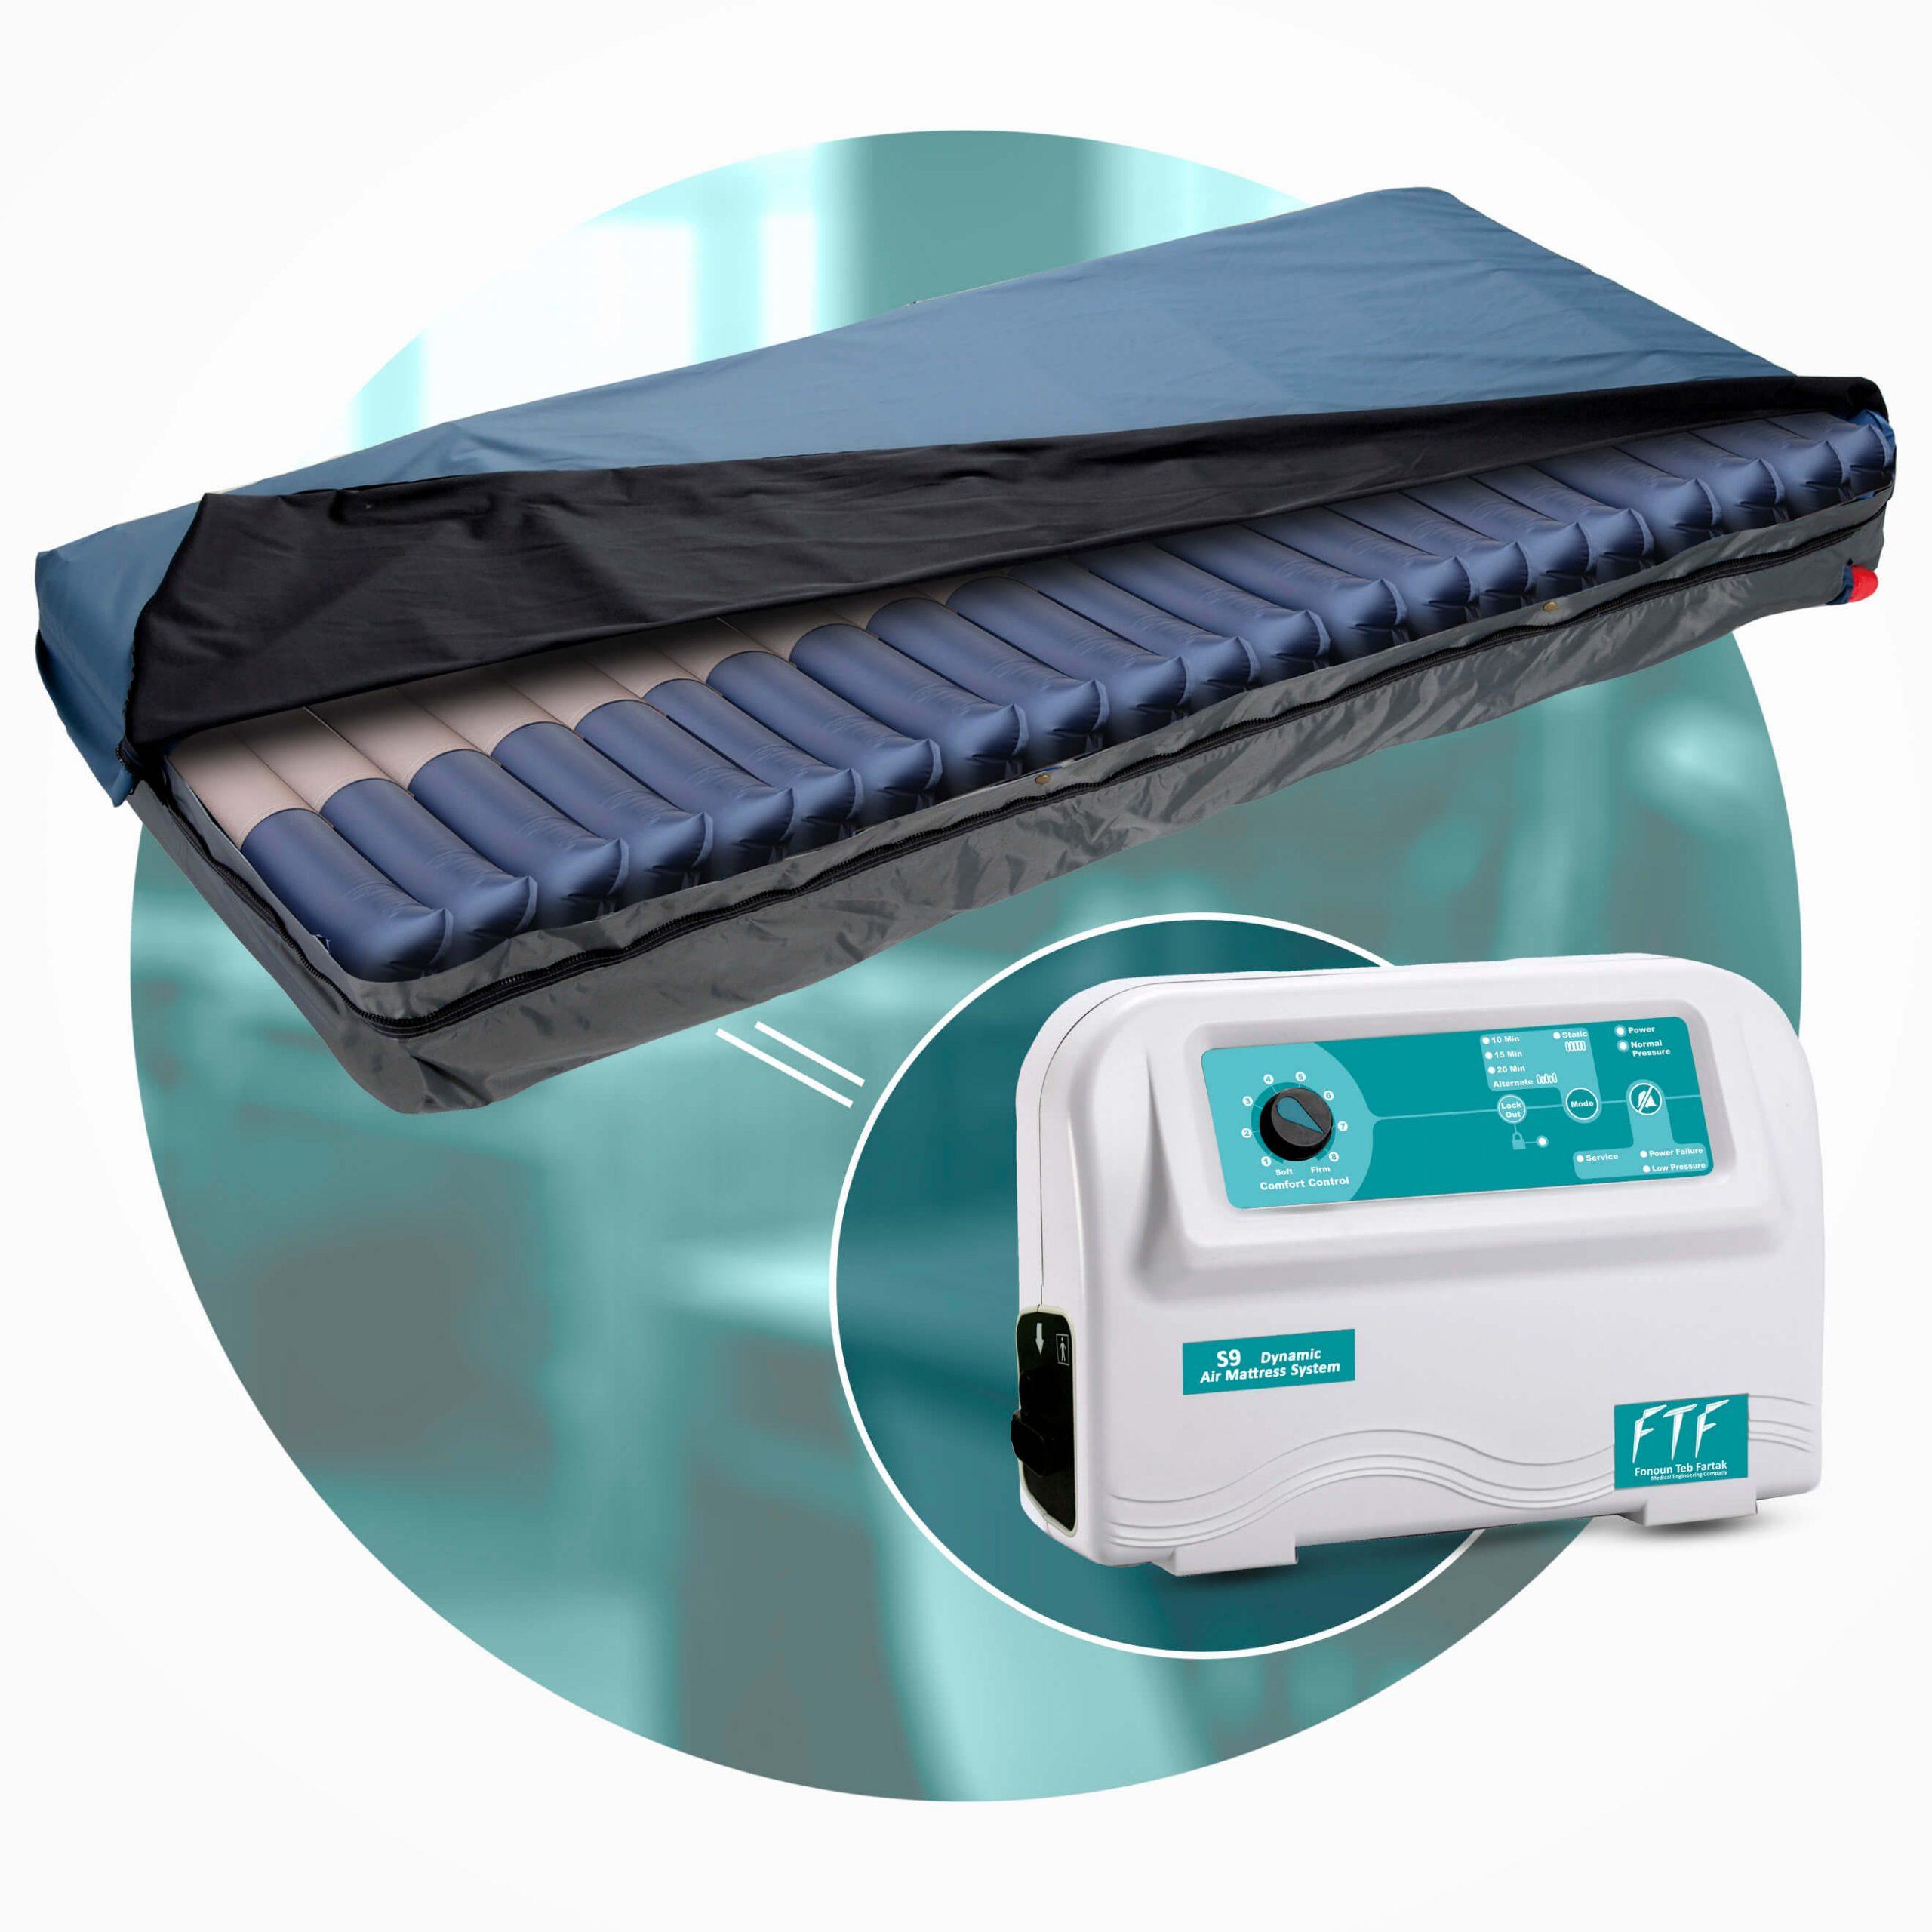 Medium risk air mattress (s9)